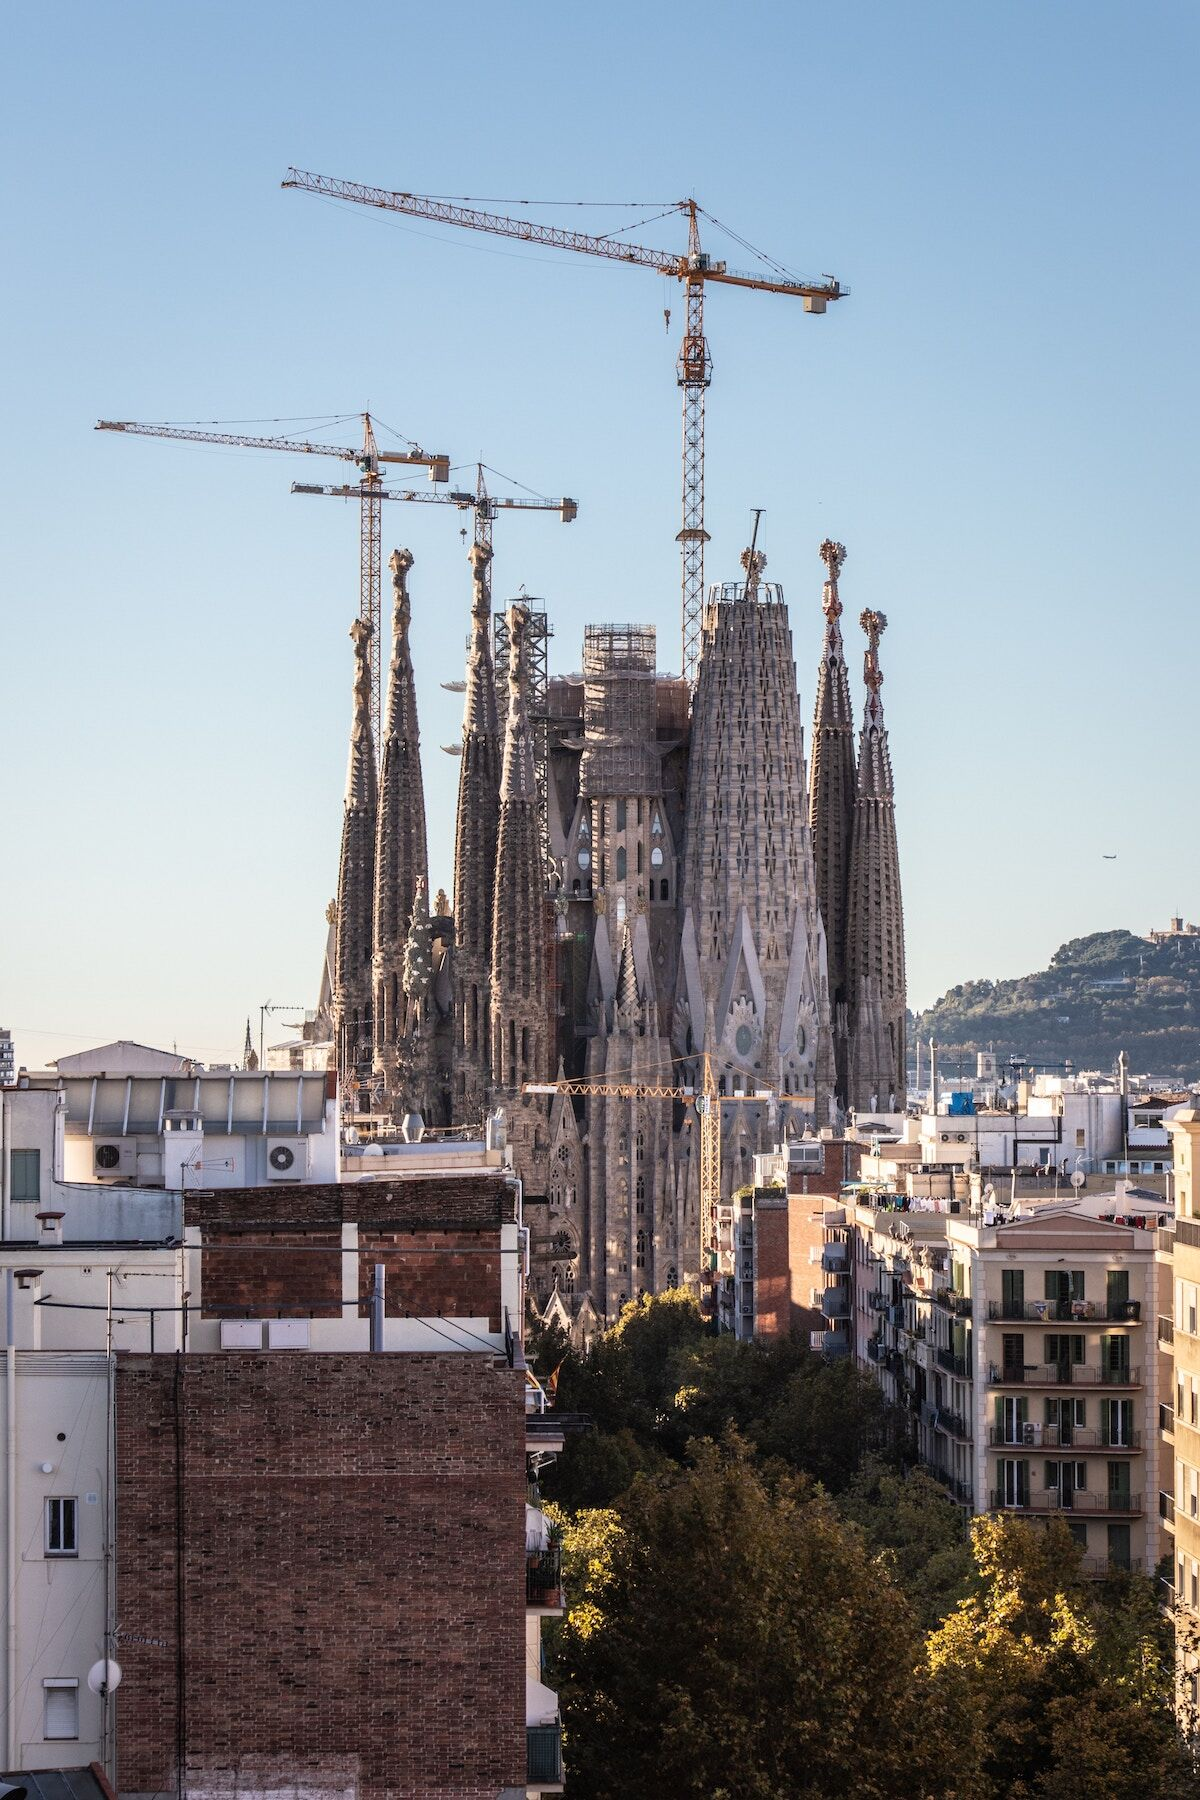 Exterior view of La Sagrada Familia, Barcelona. Photo by Angela Compagnone. Courtesy of Angela Compagnone.